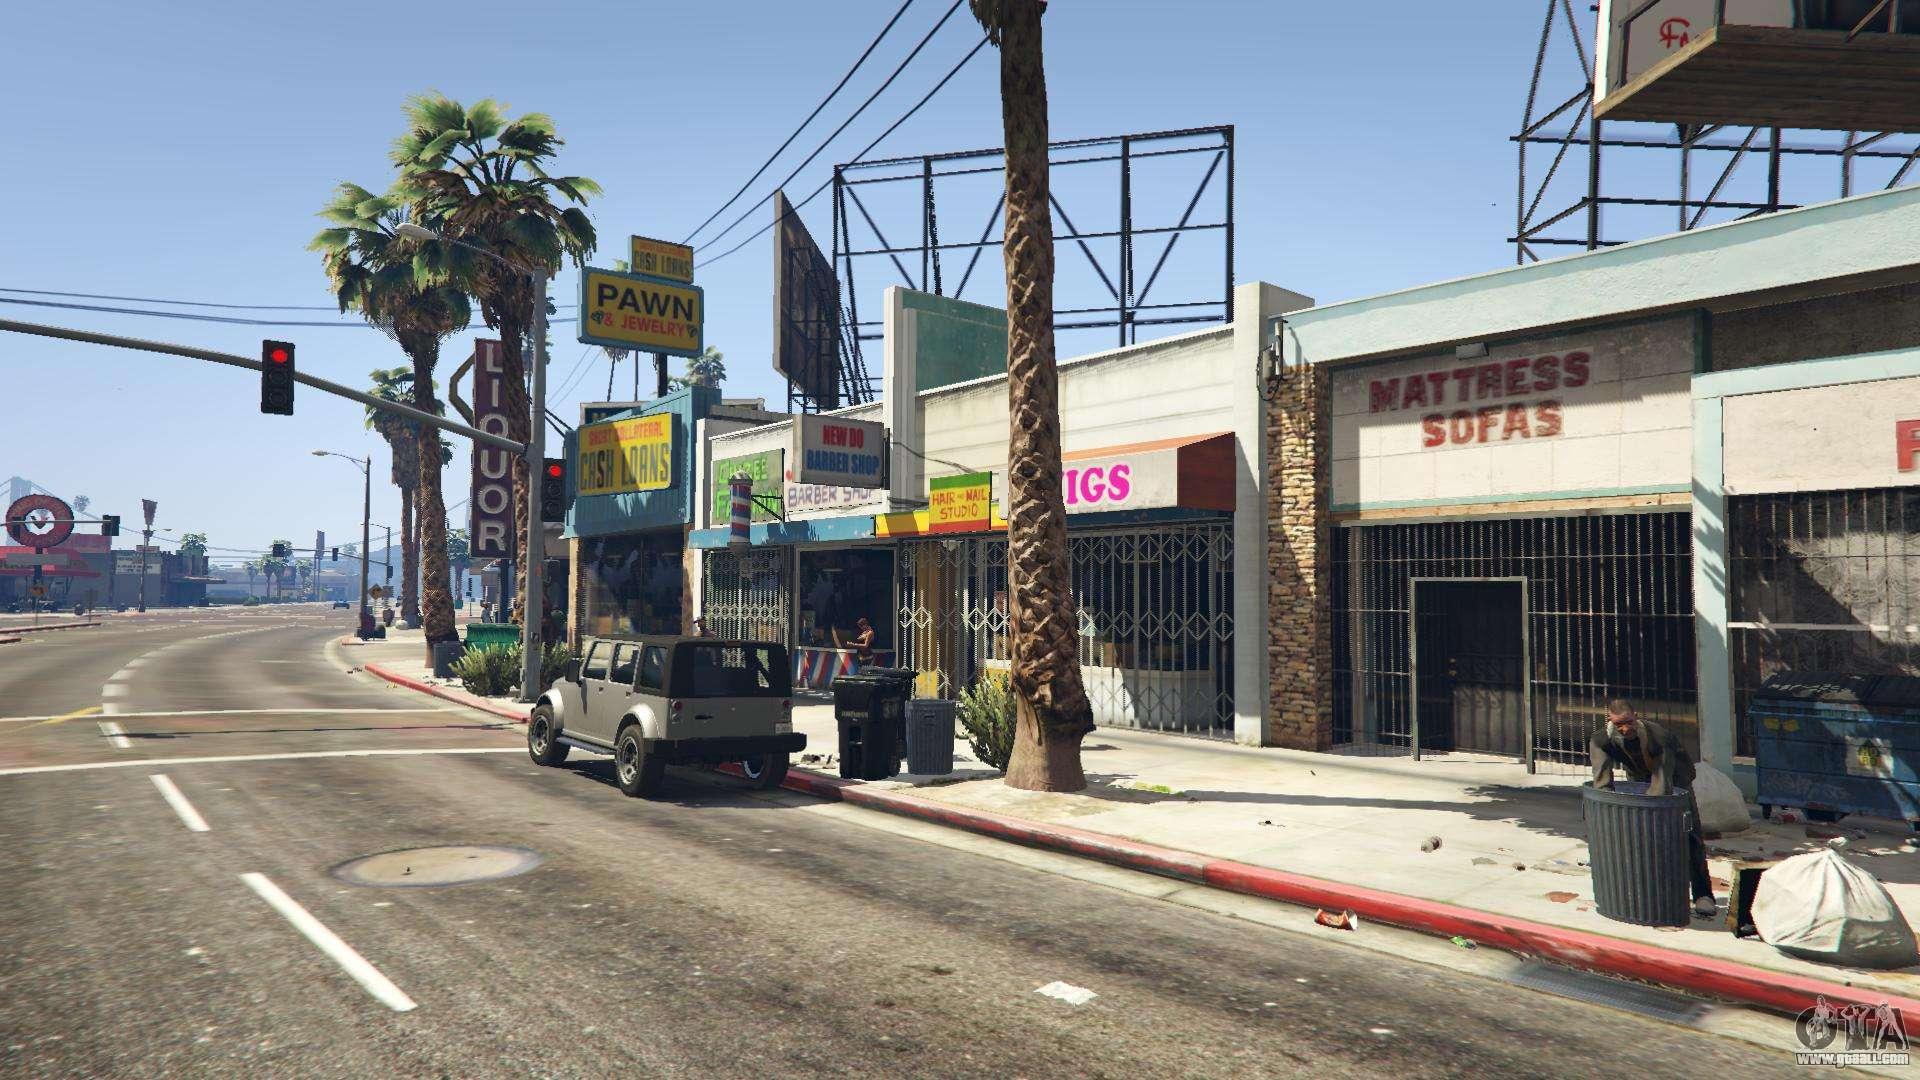 Get gta 5 free steam | Game 🎮 GTA 5 for Windows PC, Xbox